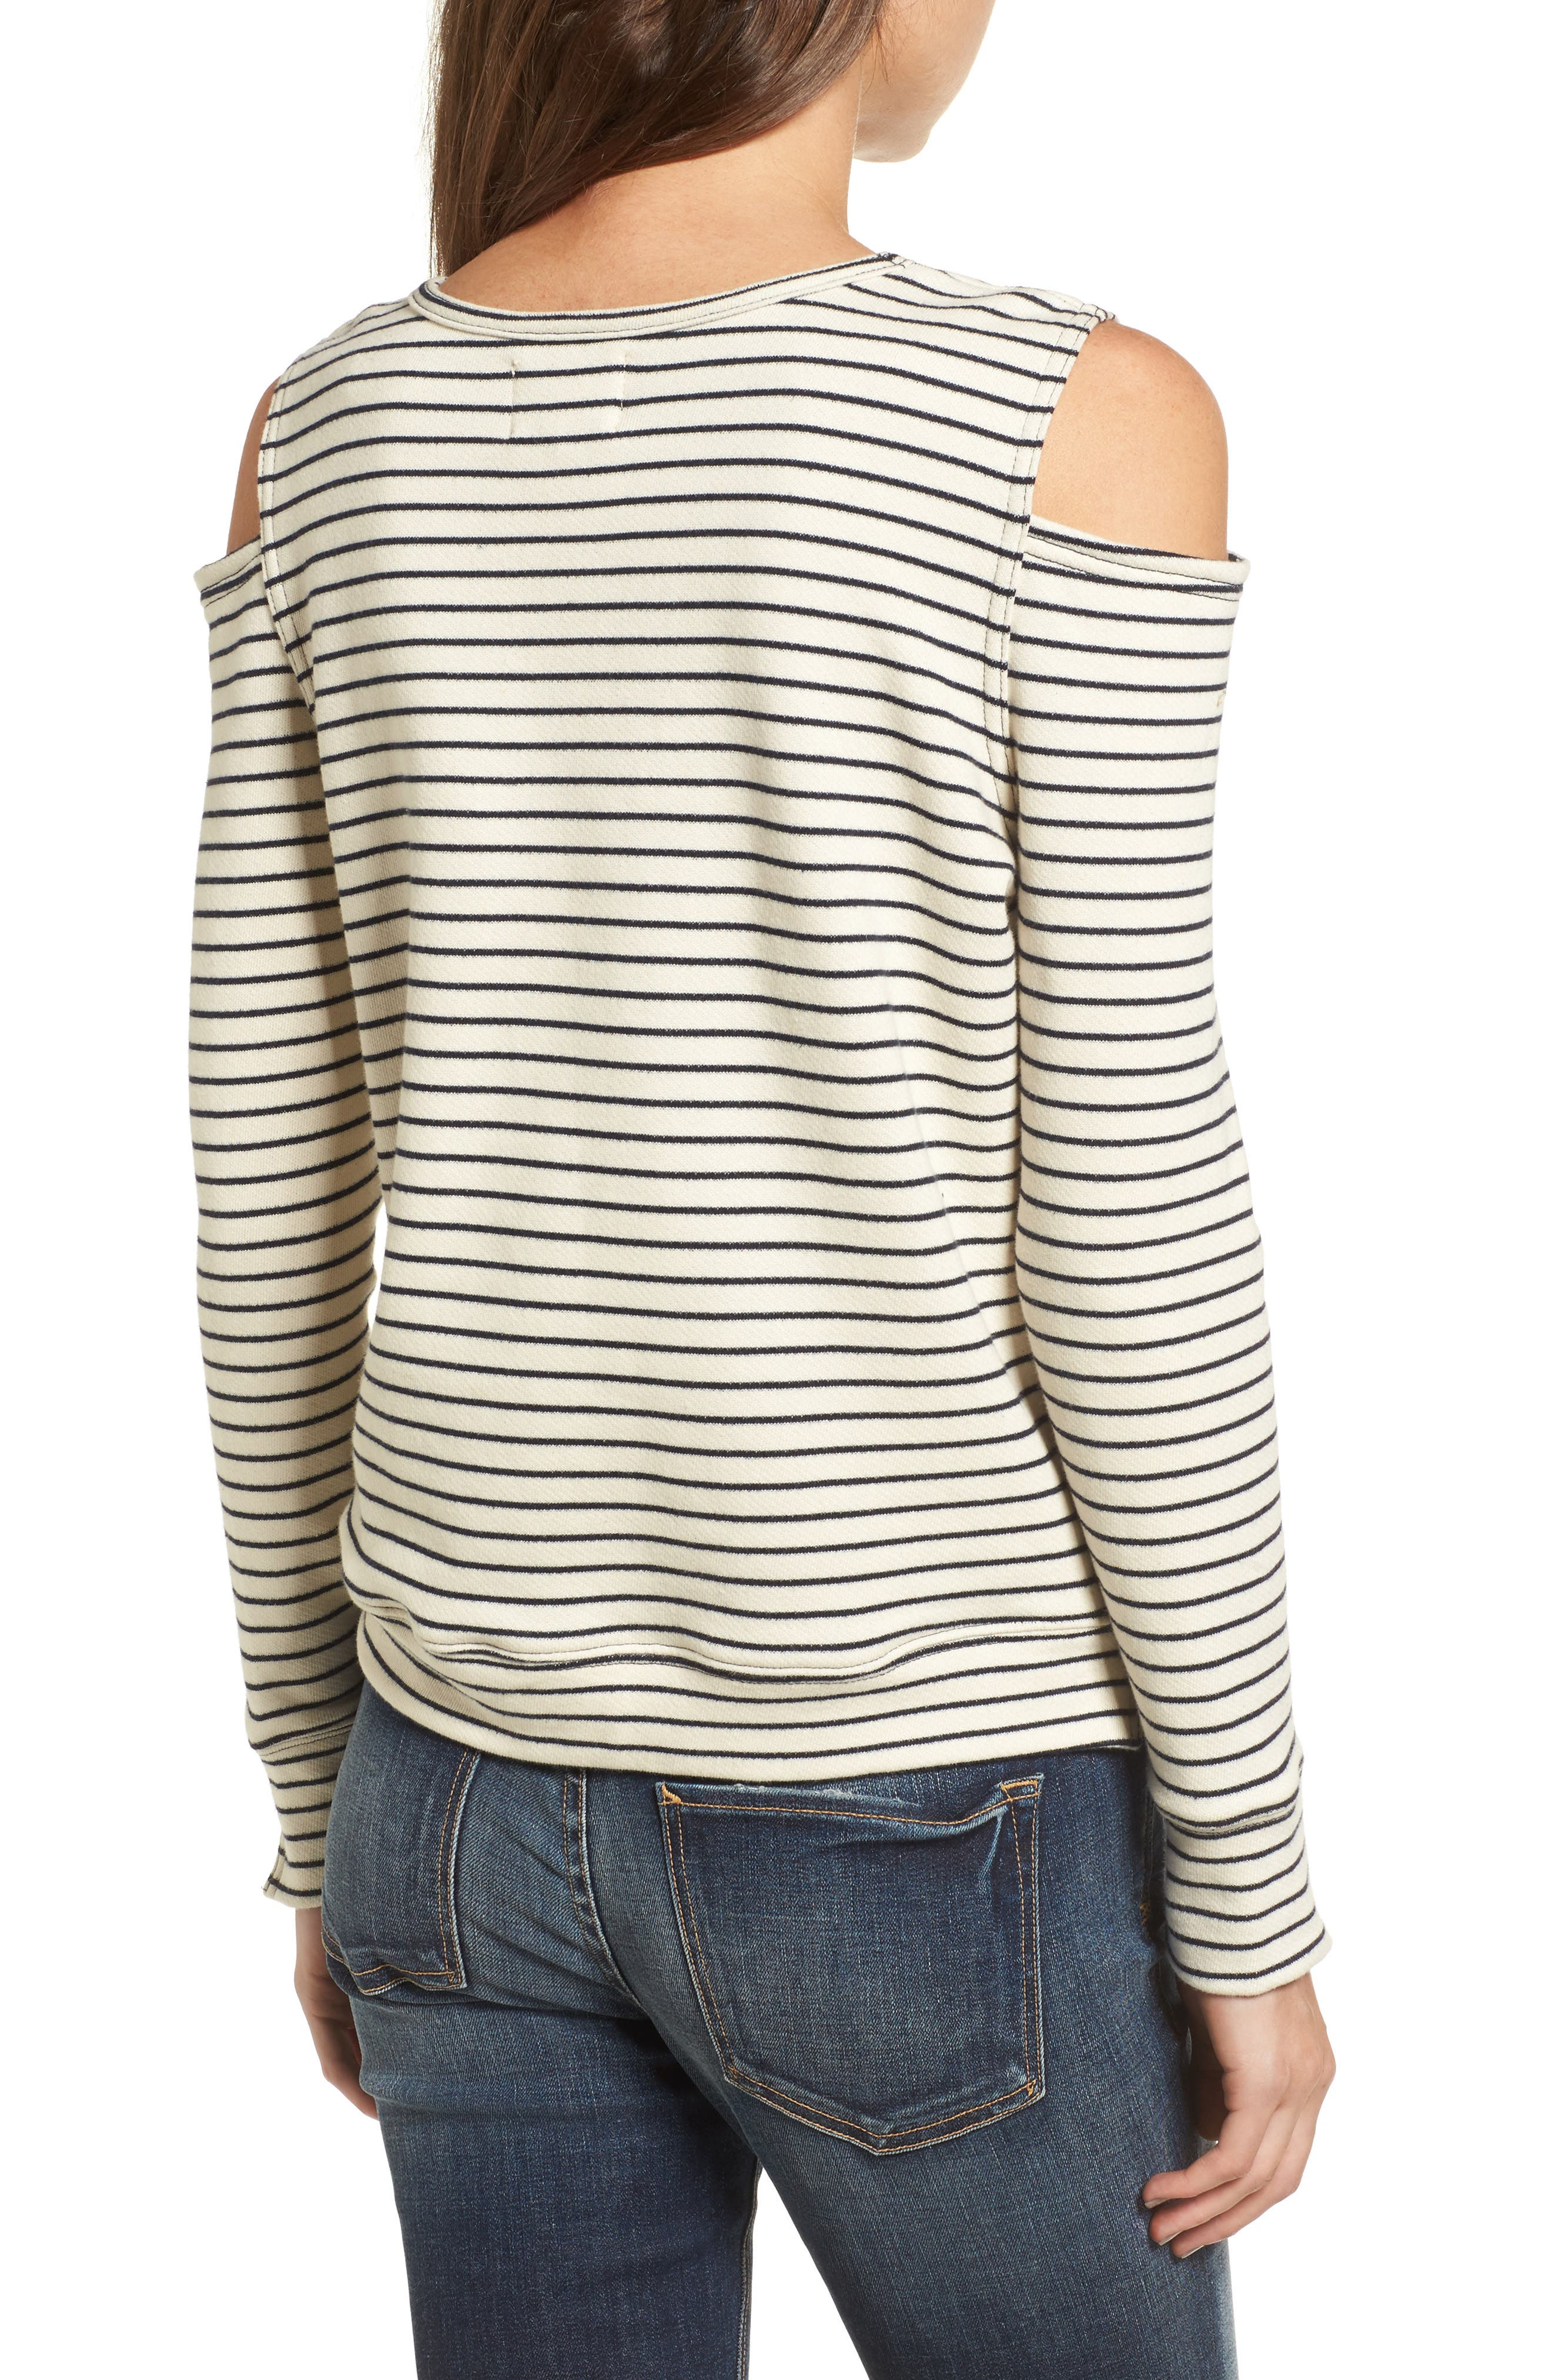 Wildair Cold Shoulder Sweatshirt,                             Alternate thumbnail 2, color,                             460